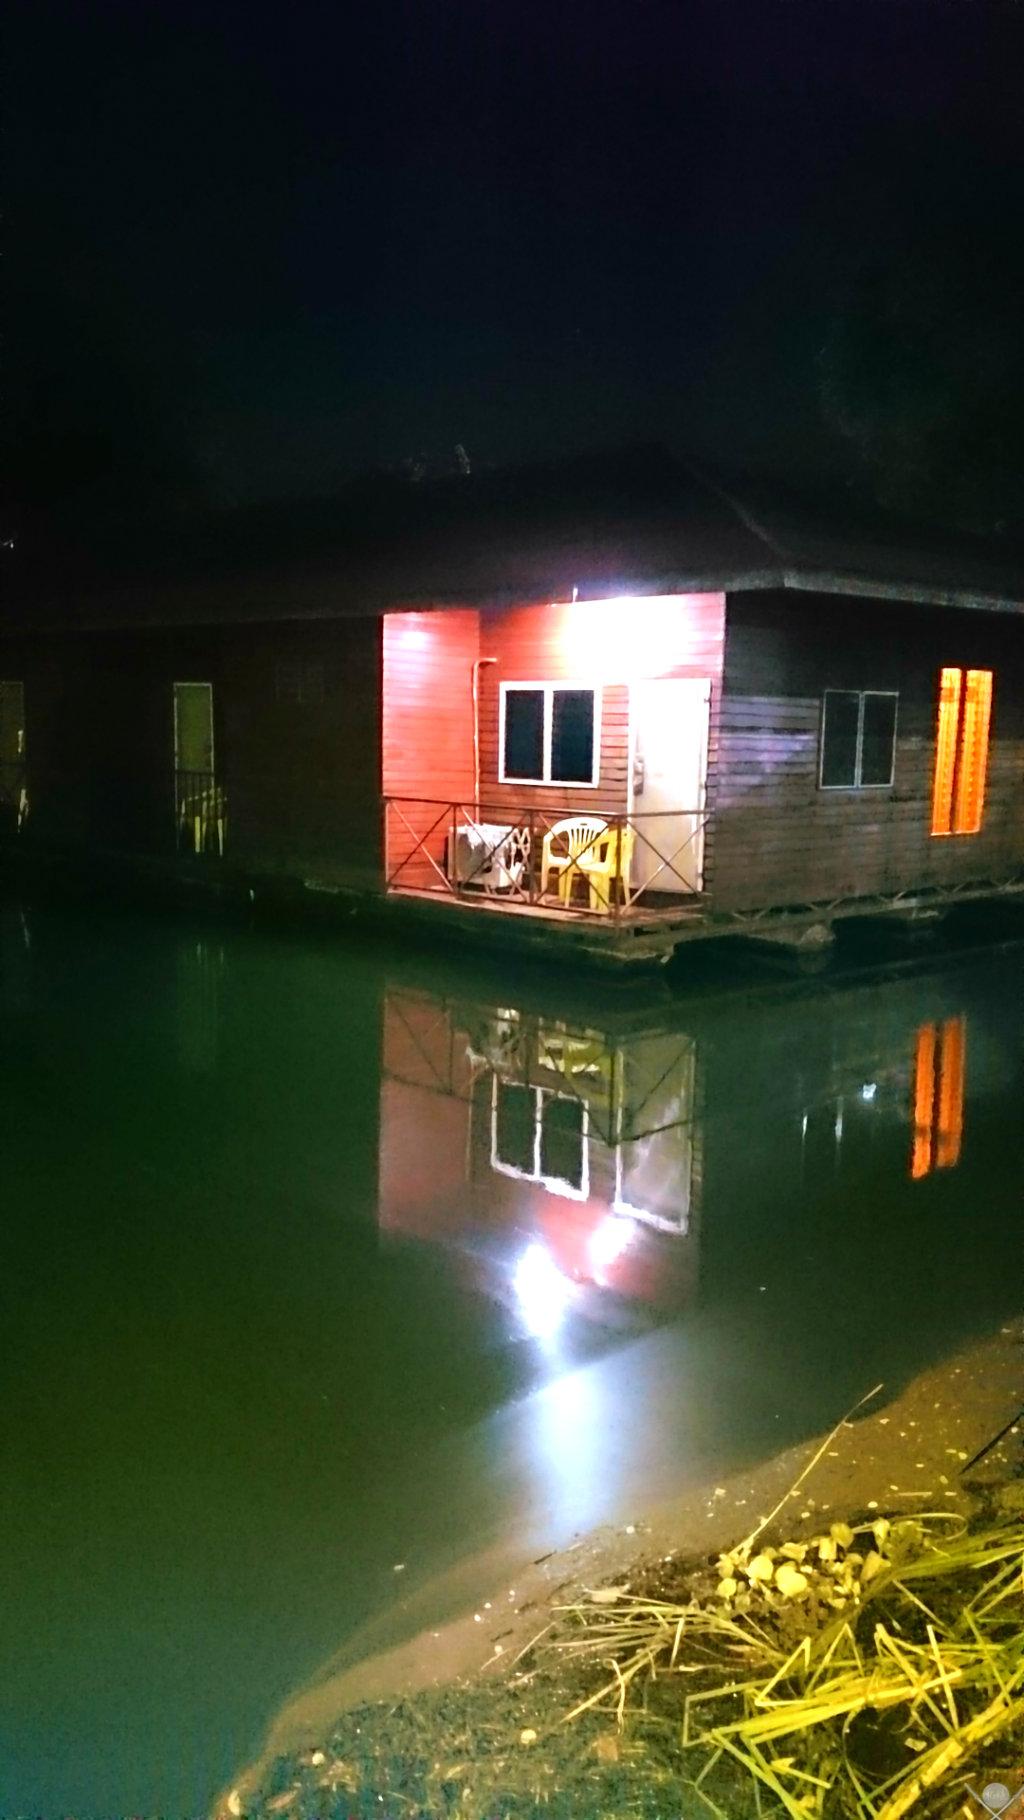 Thailand Kanchanaburi Tara Raft 2 Vida de Tsuge VDT 1024x1820